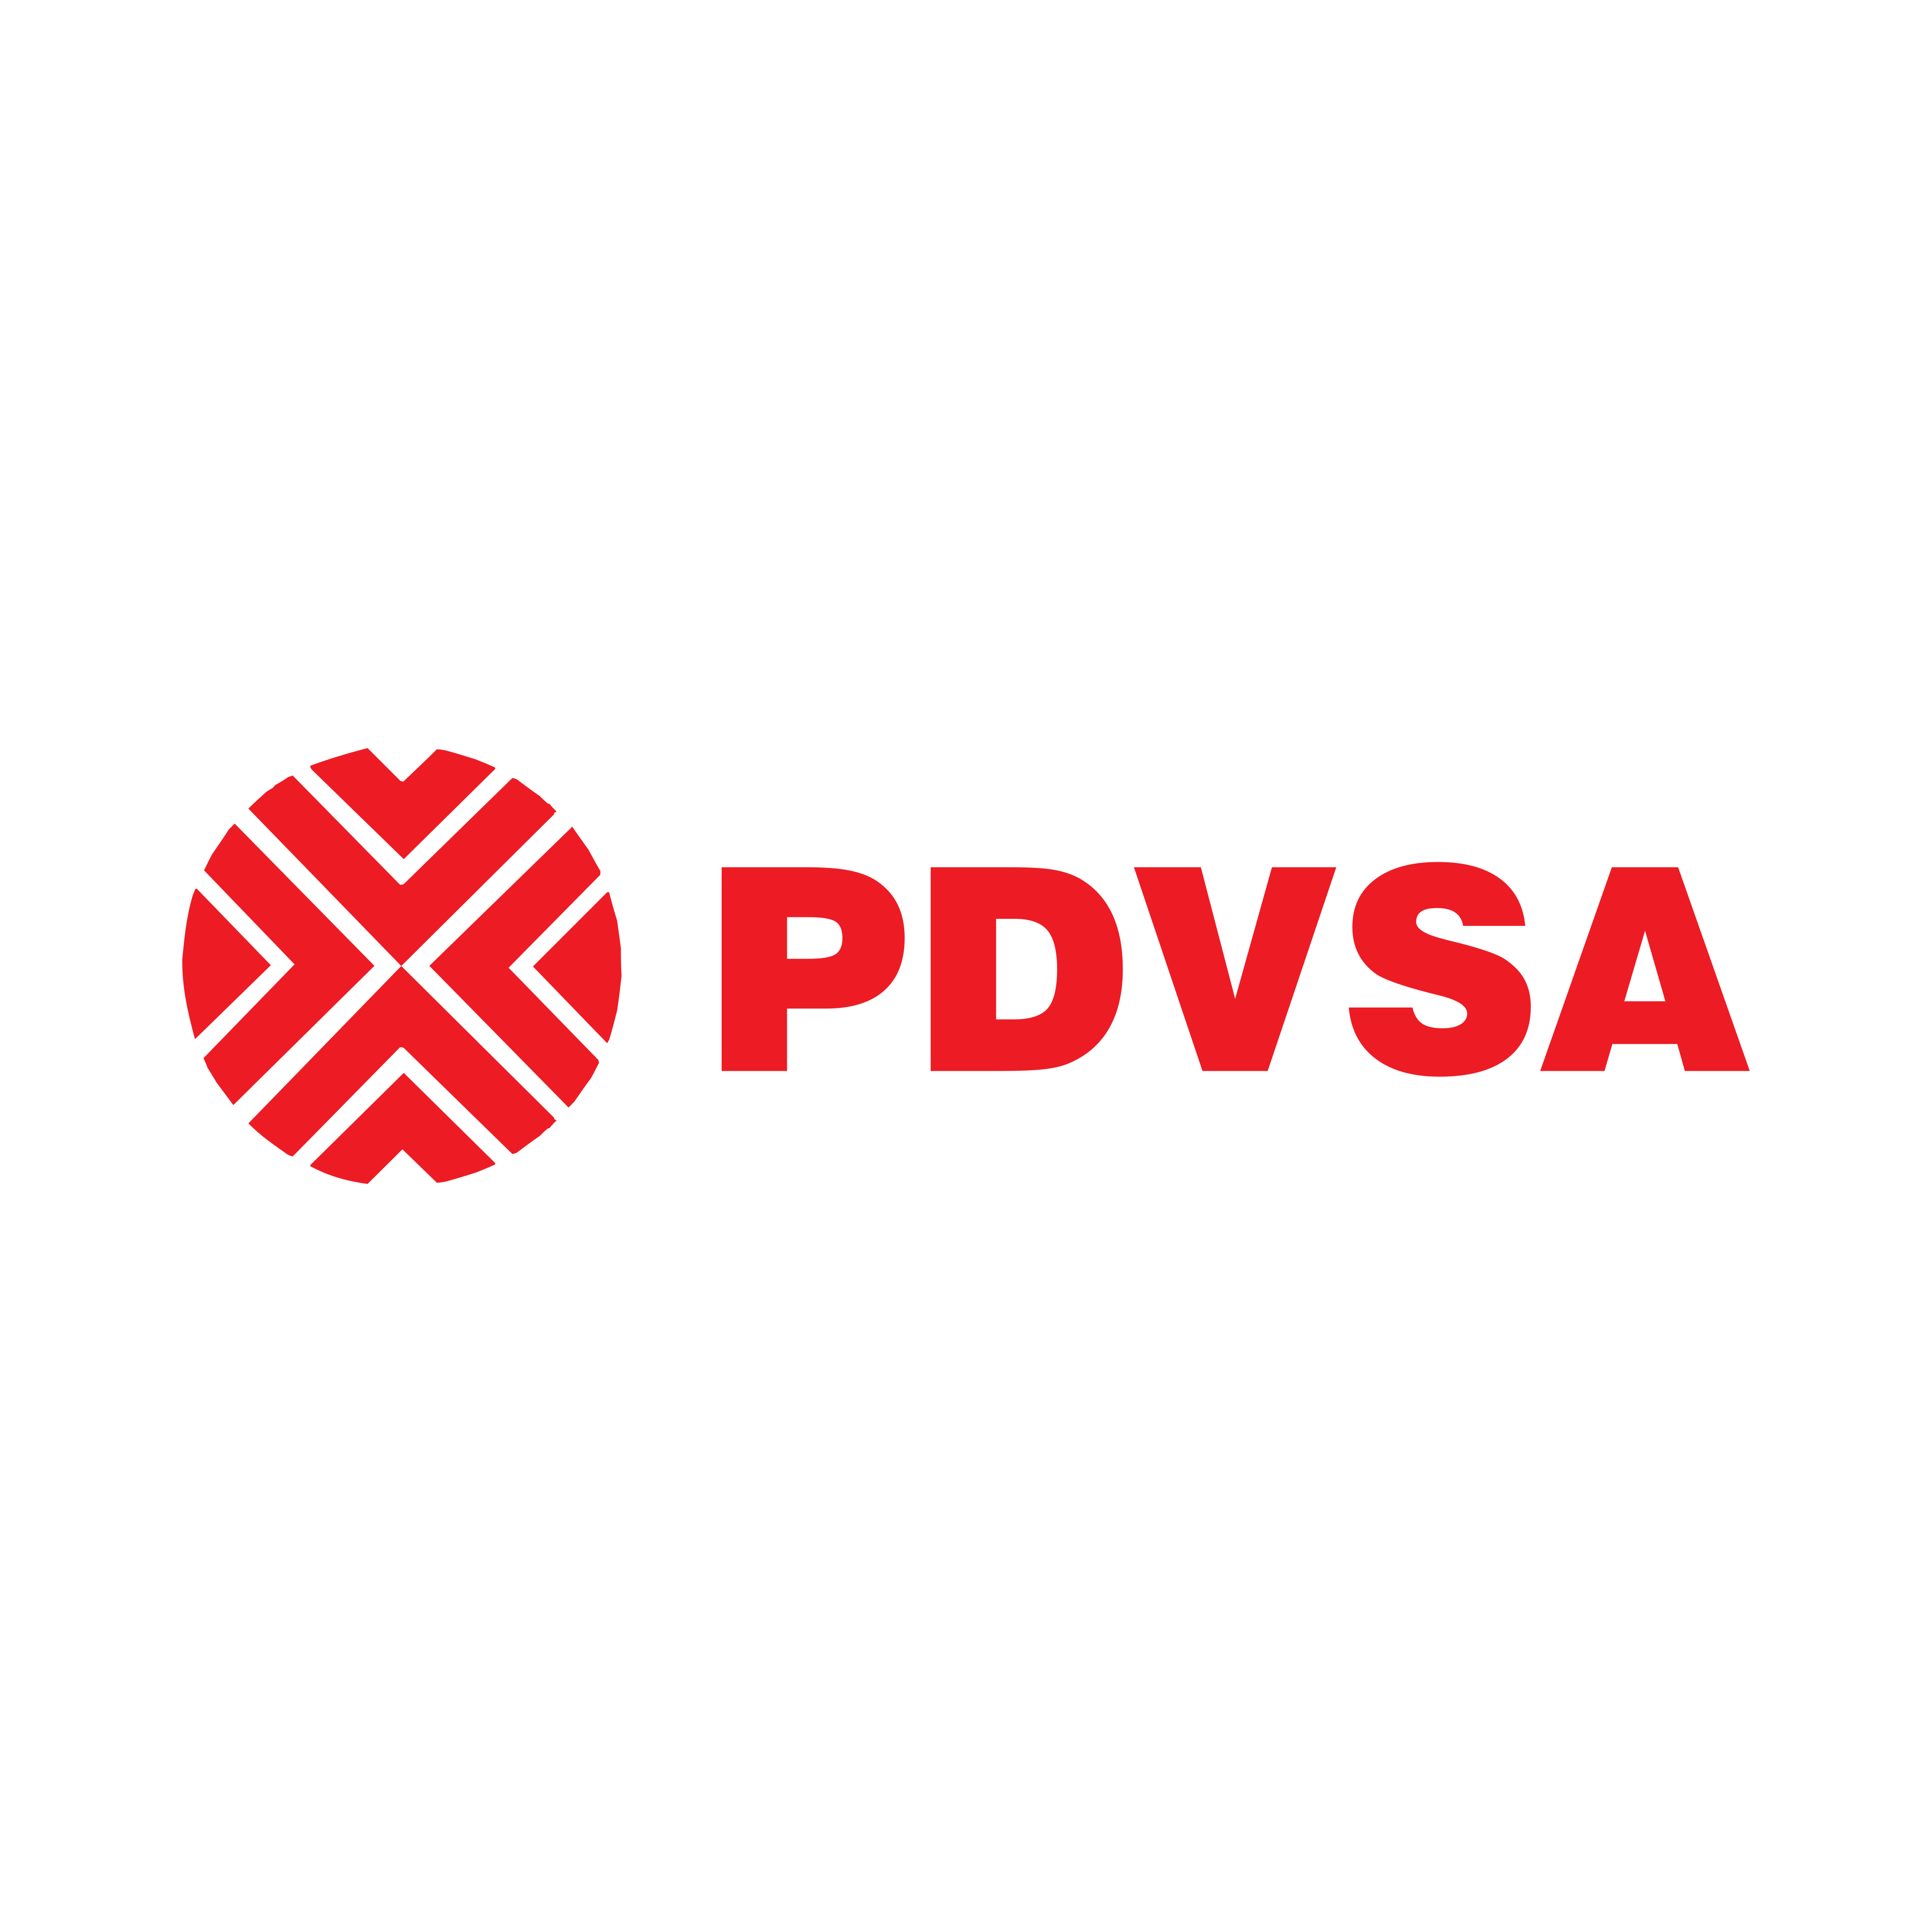 PDVSA Logo PNG.